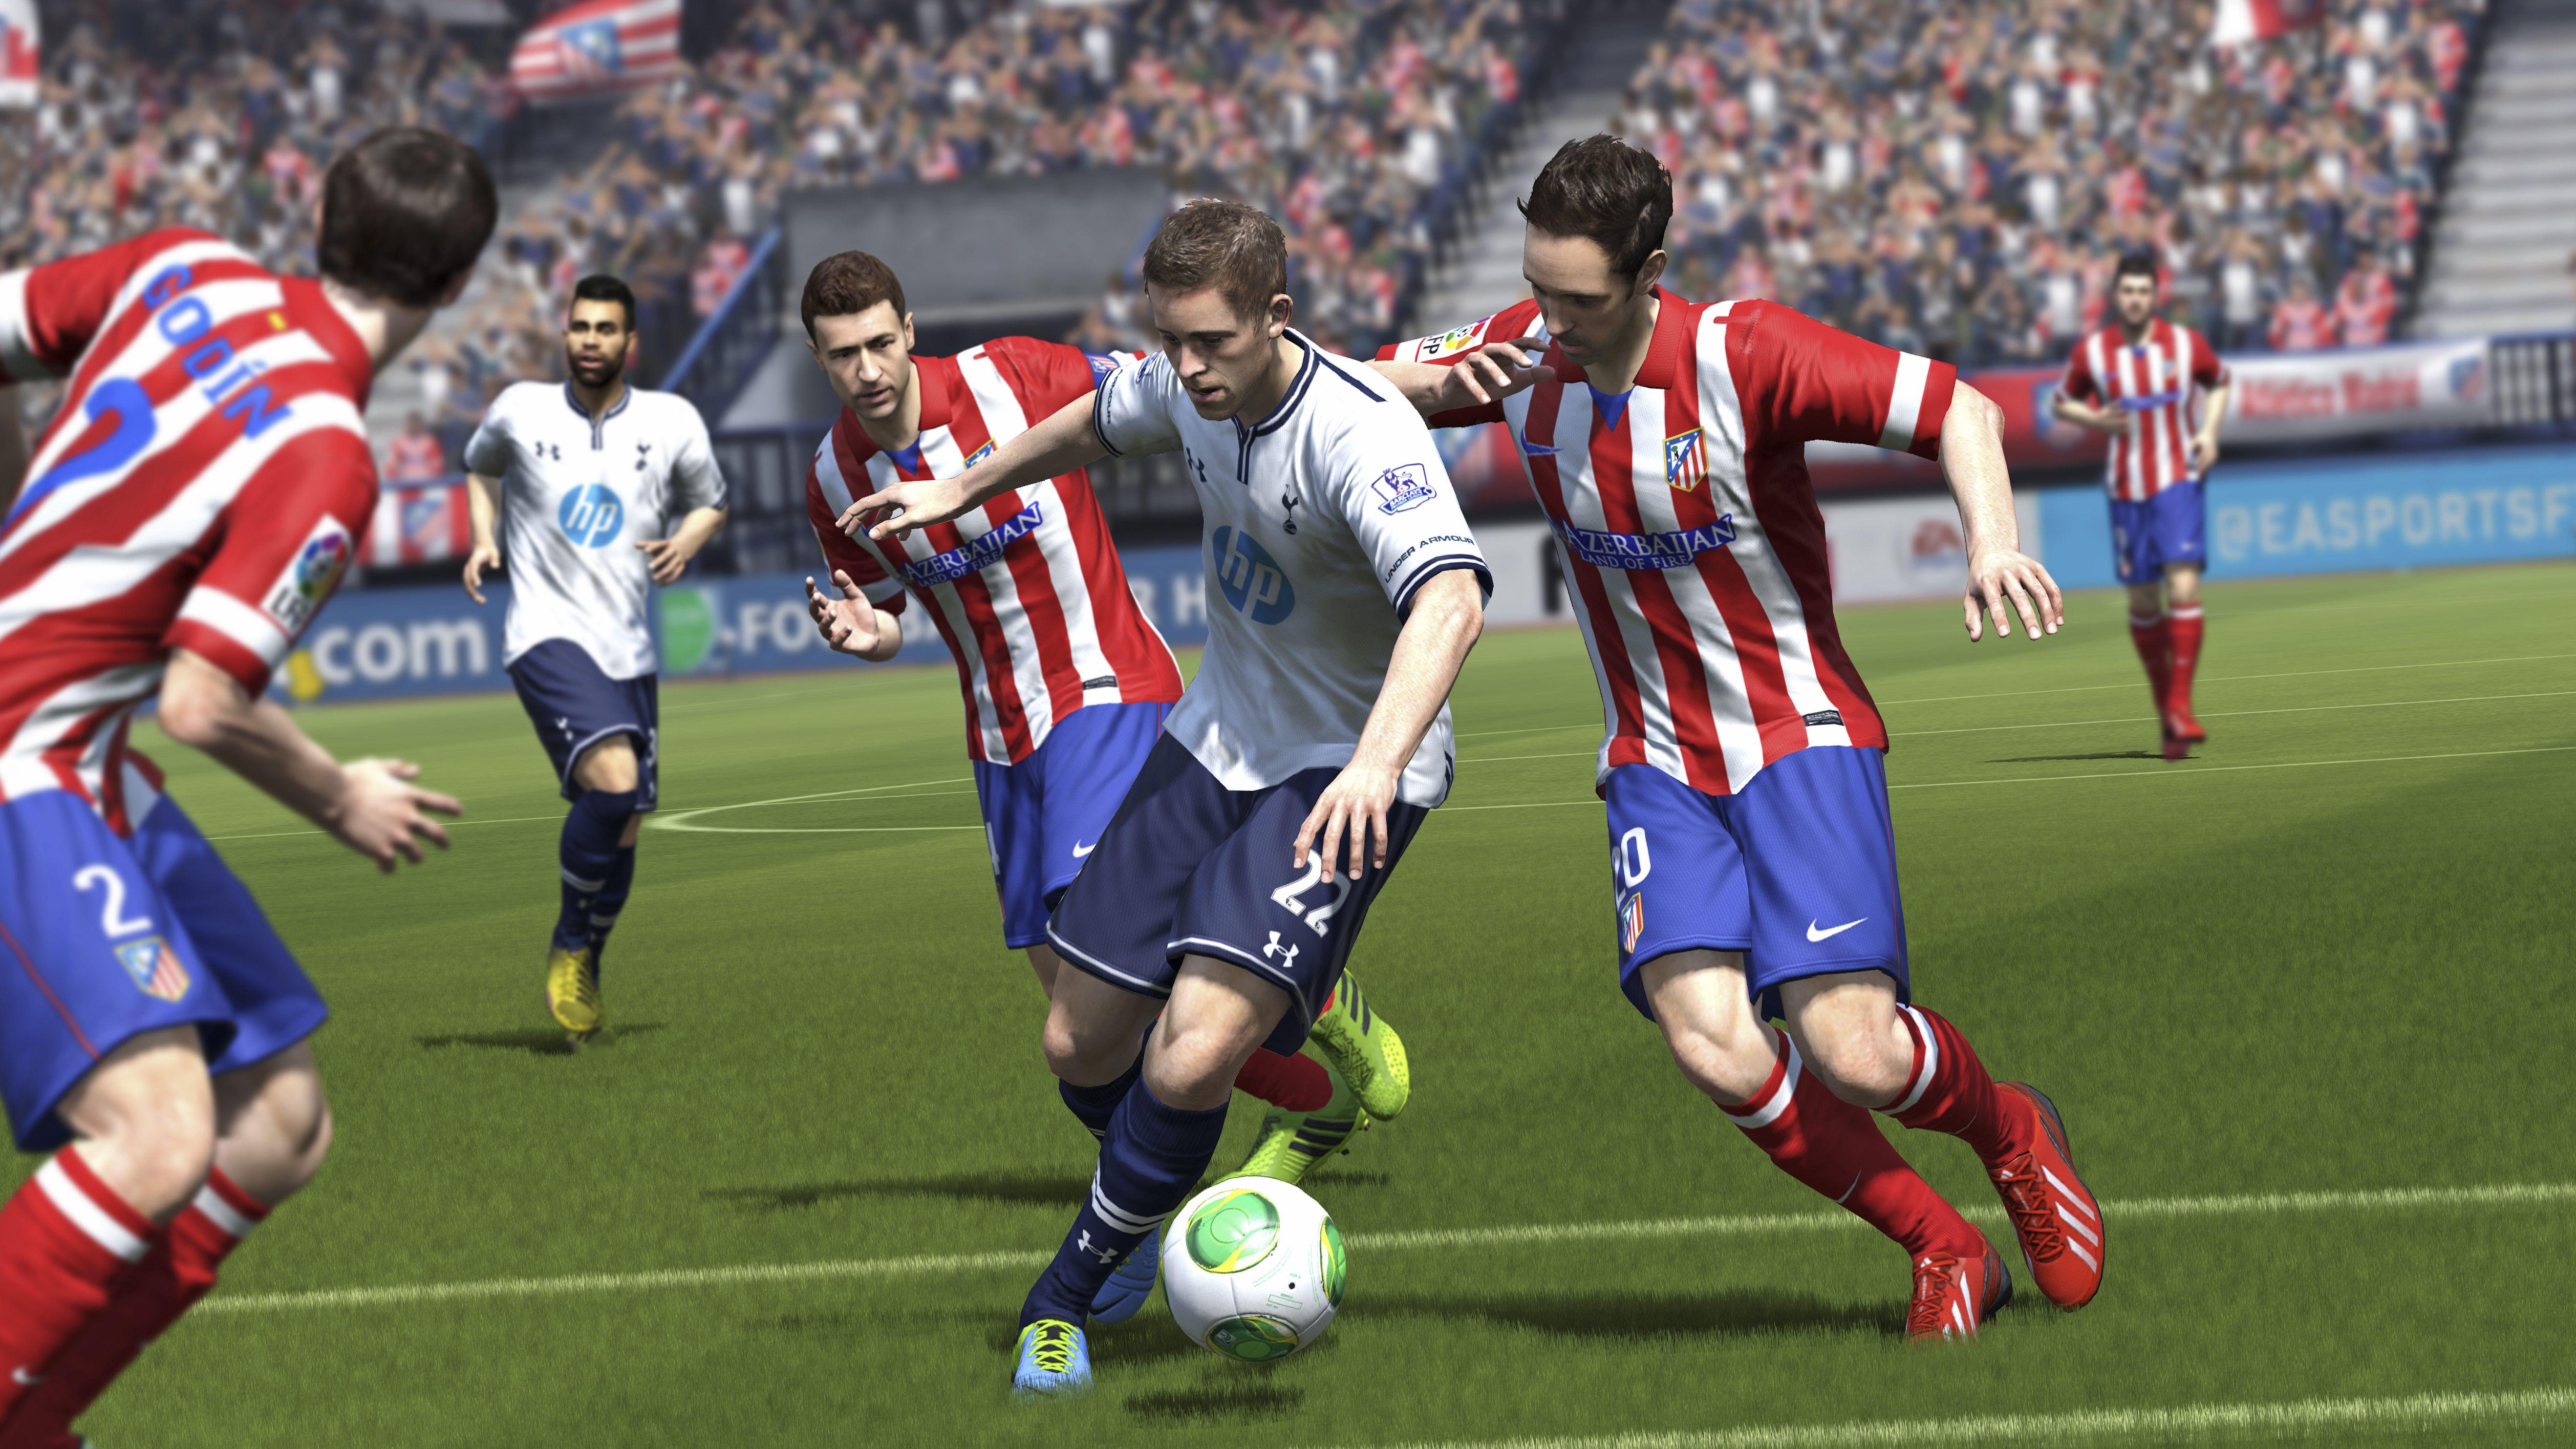 Obrázky z inFamous, NFS: Rivals, FIFA 14, Alien Rage 86403